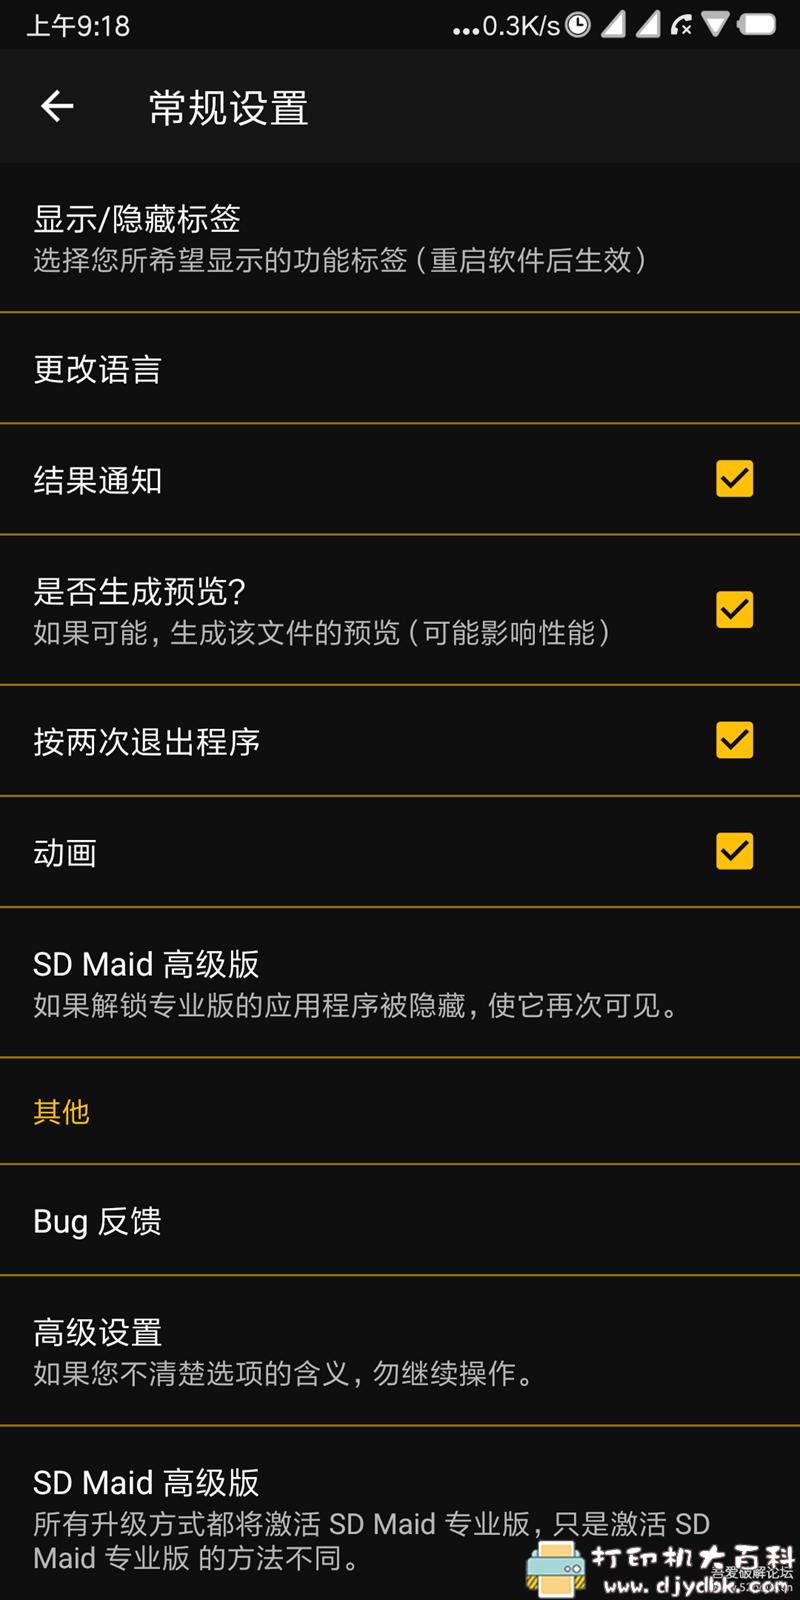 [Android]<4.18更新>系统级优化工具 [SD Maid v4.15.9] SD女佣直装解锁高级版图片 No.3